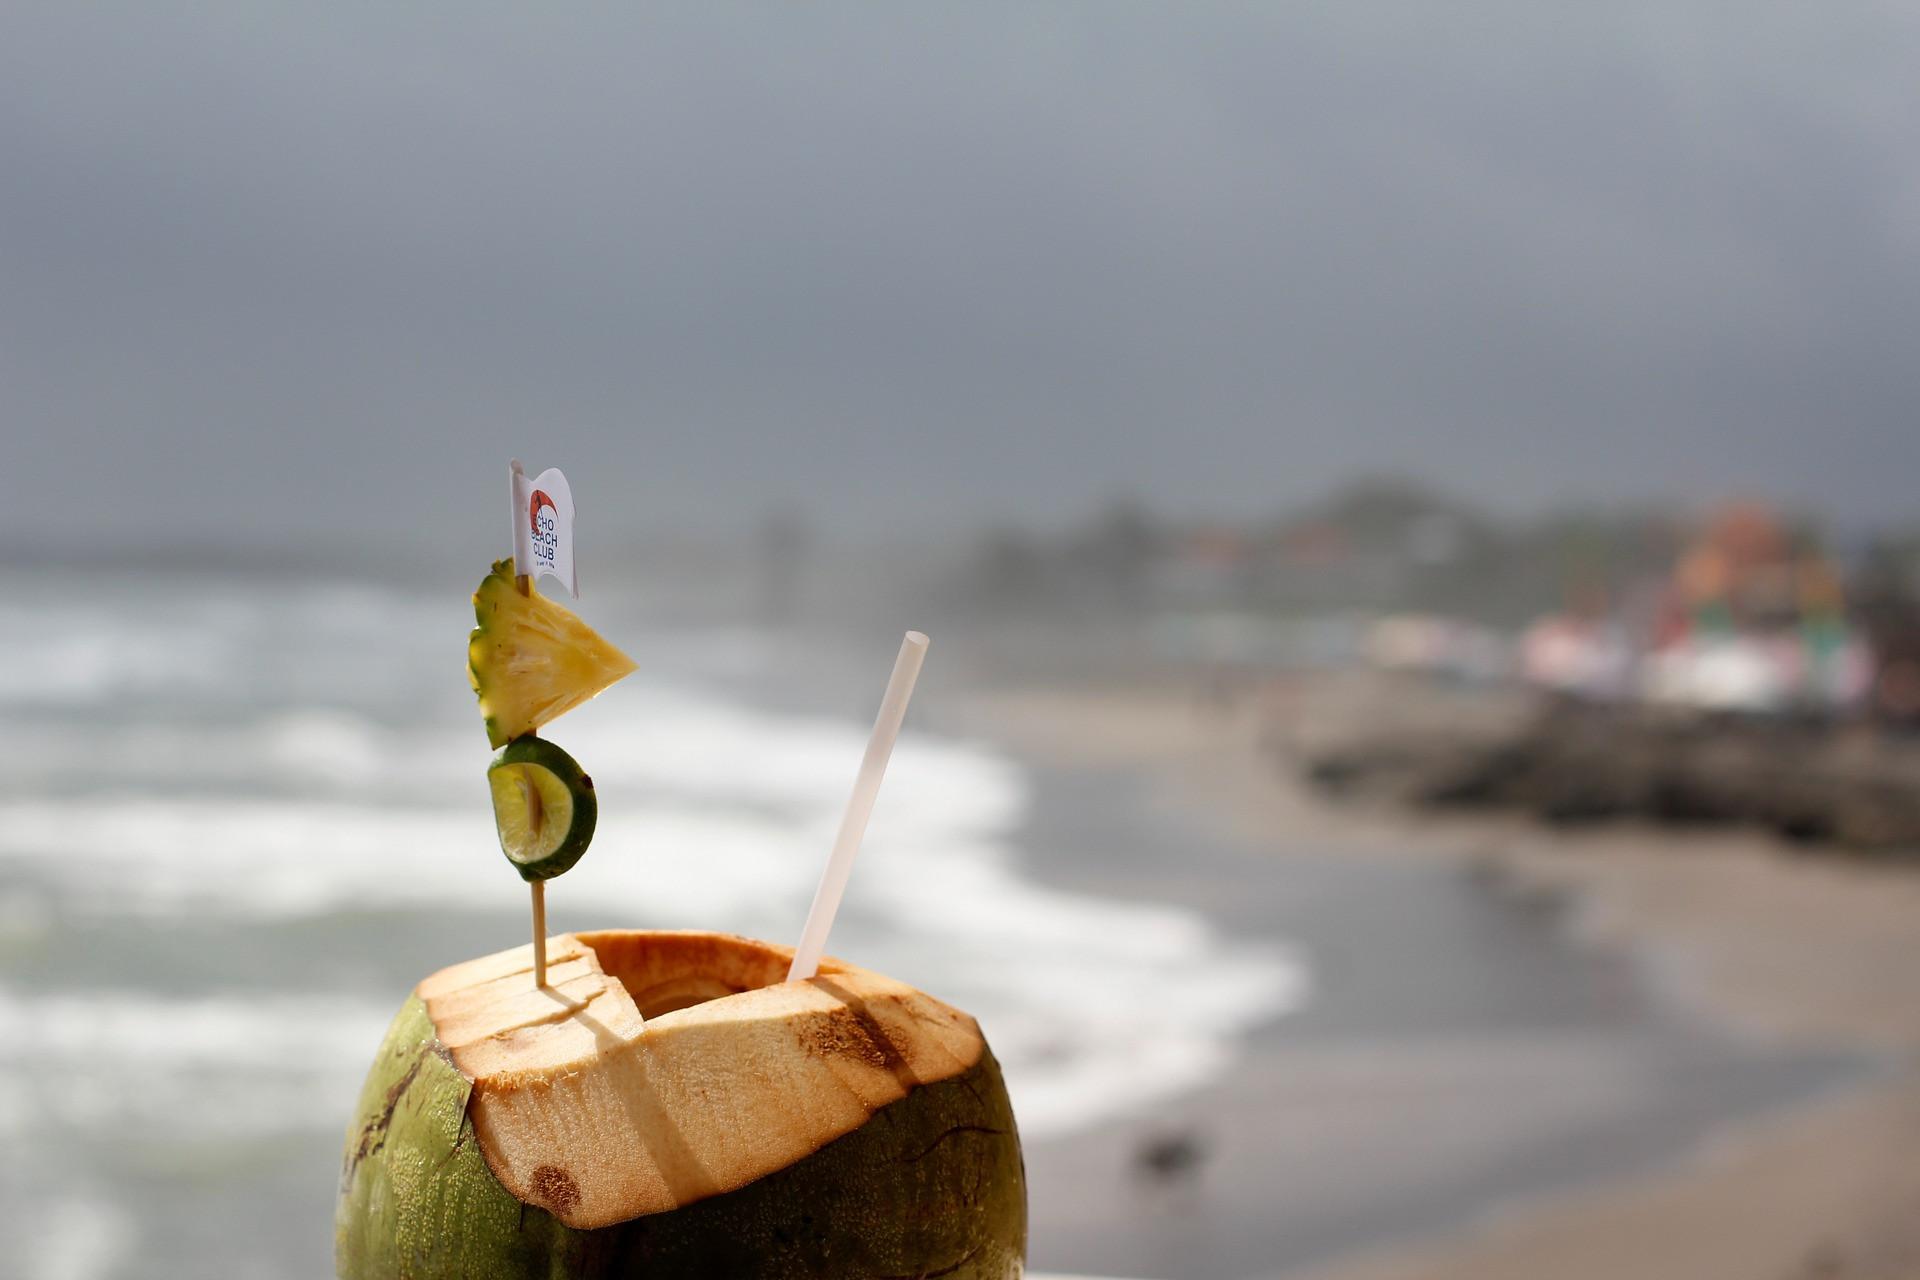 3 Manfaat Minum Air Kelapa Secara Rutin - JPNN.com